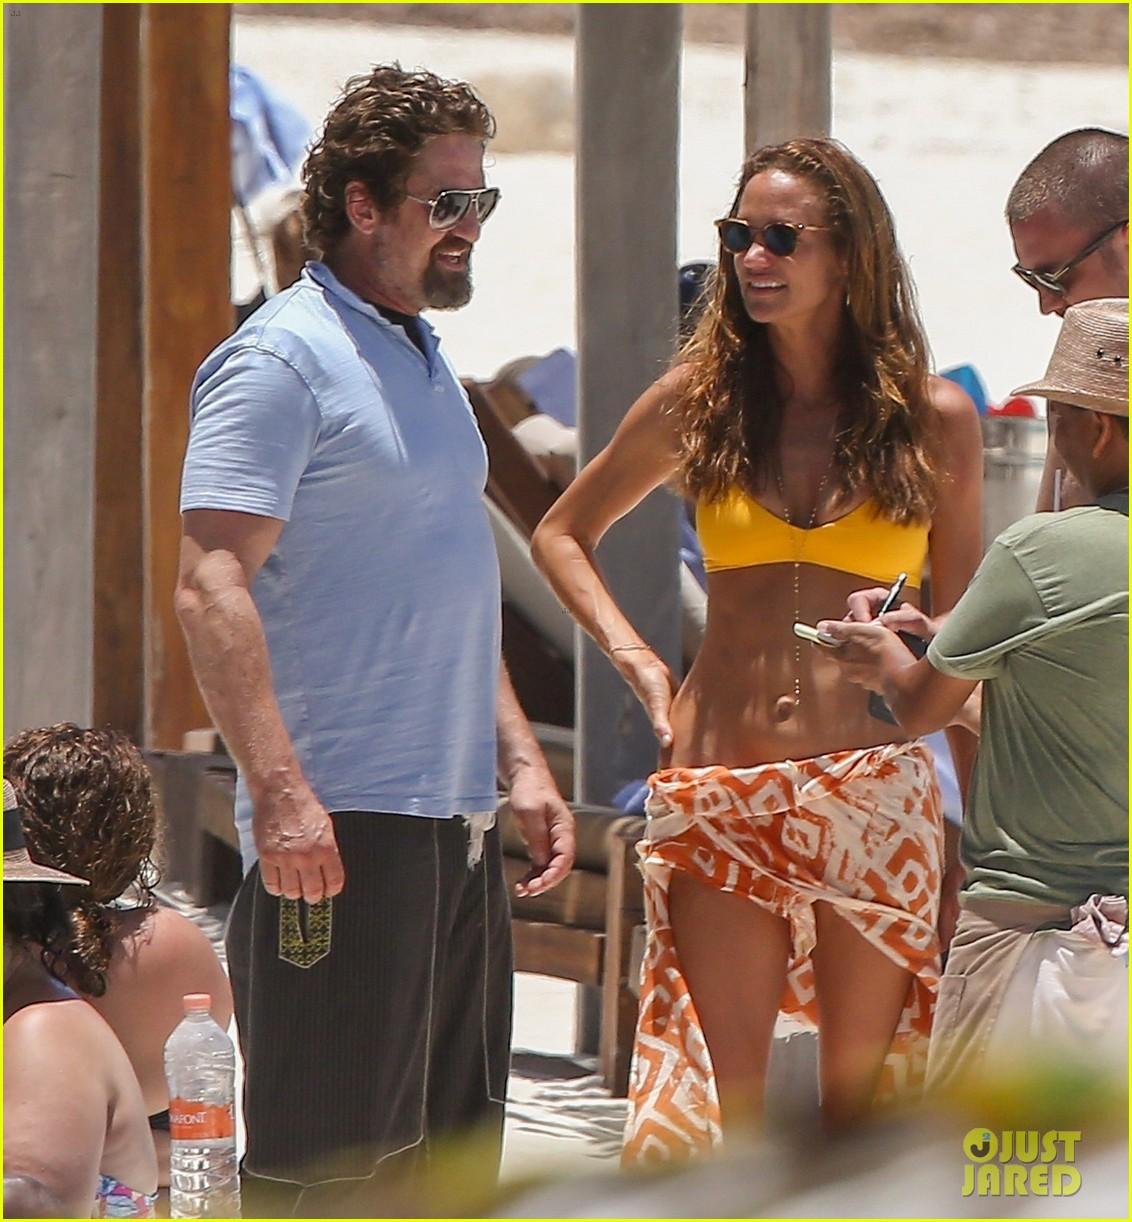 gerard butler on again gf hit the beach in mexico15